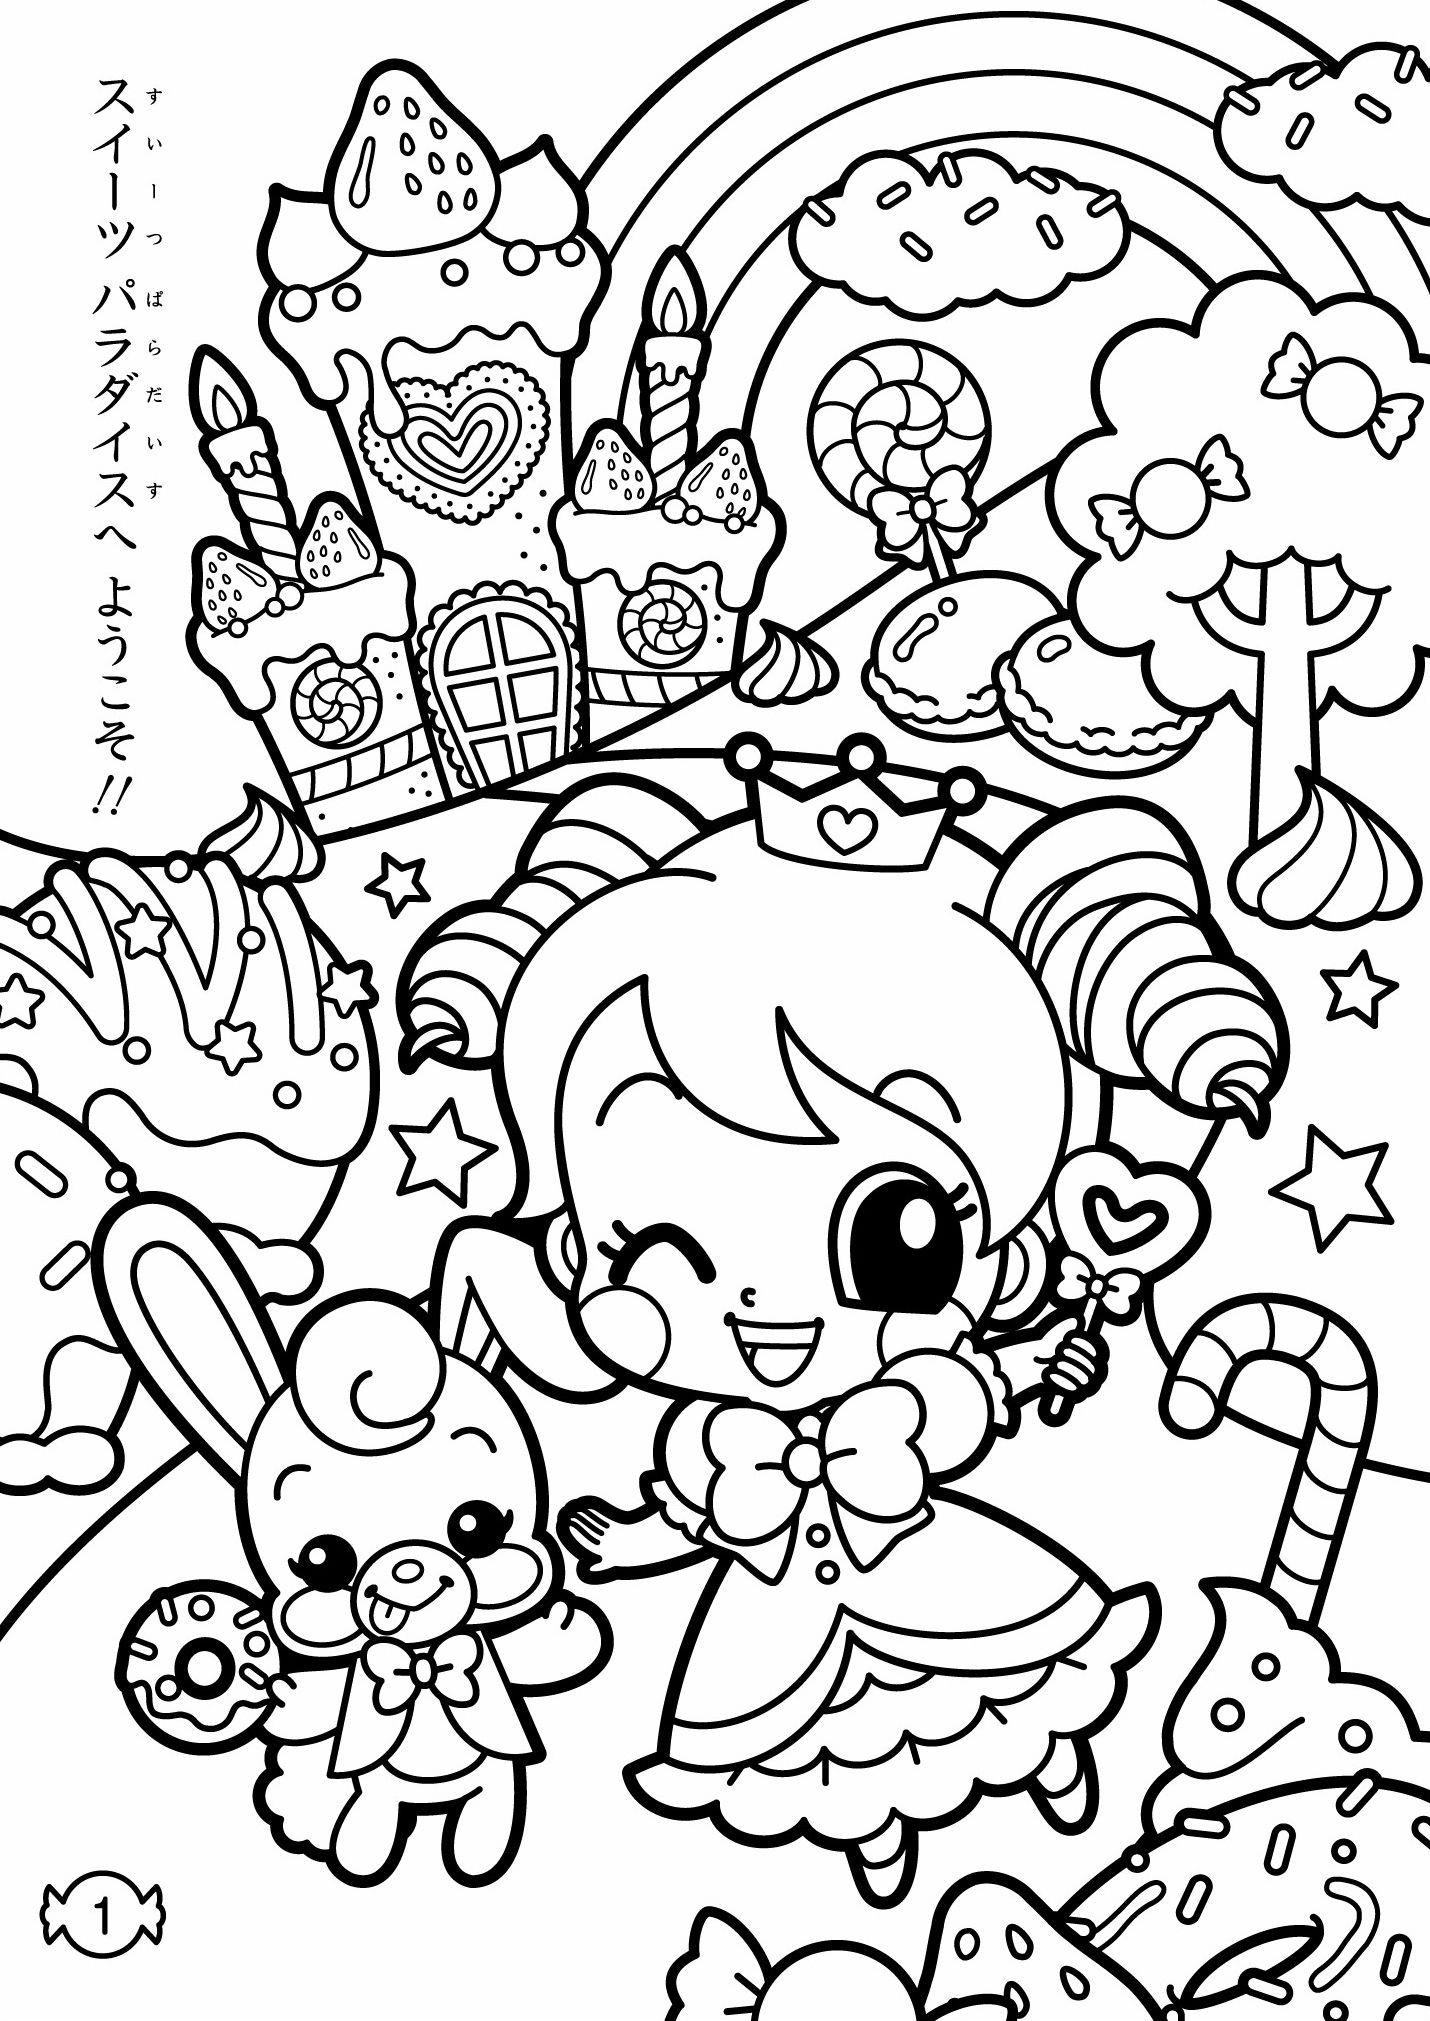 Kawaii Sweets Coloring Pages